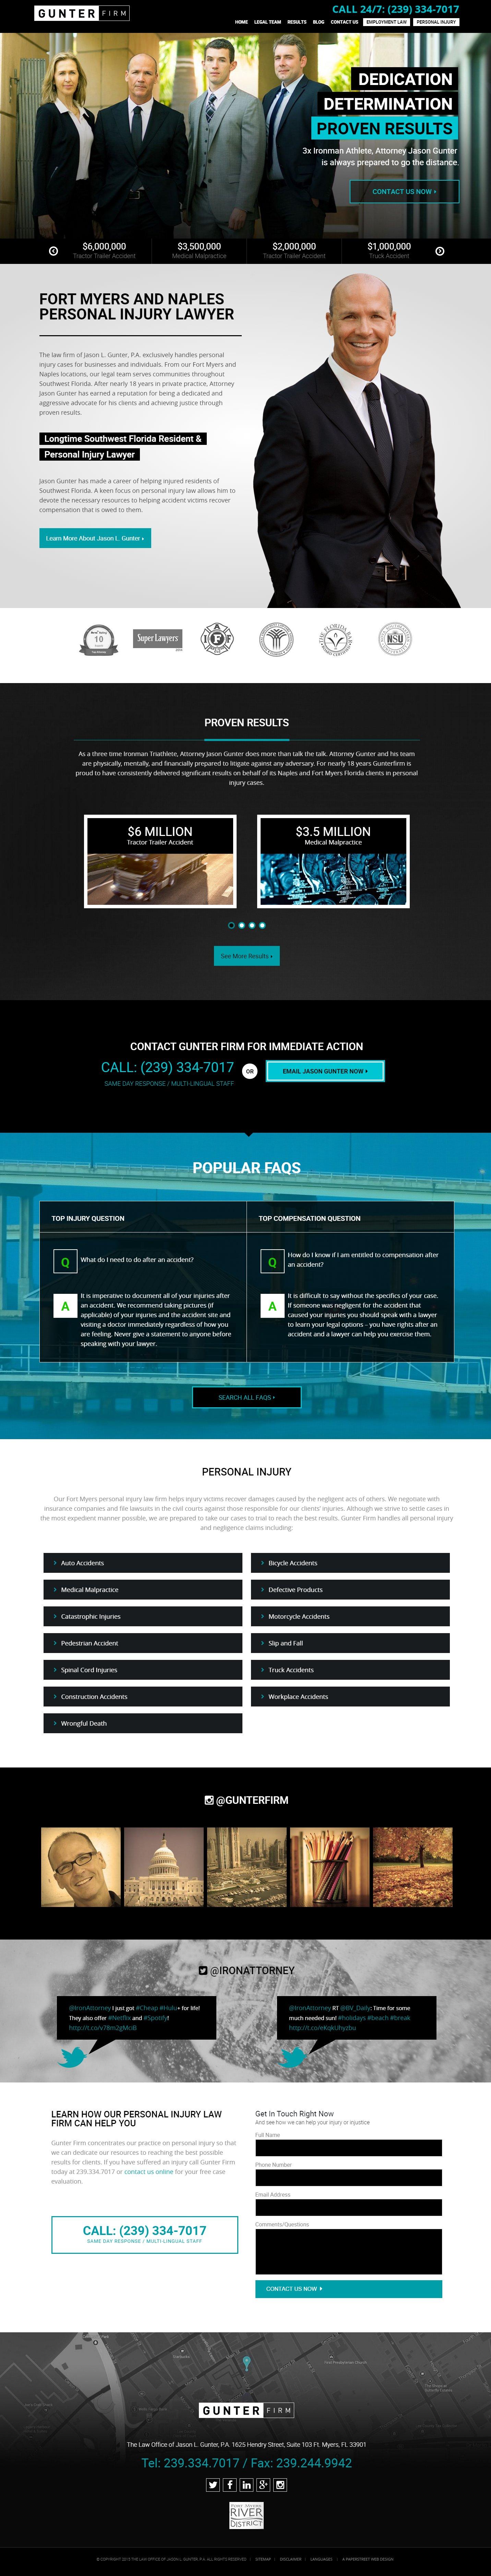 Lawyer Web Design Attorney Websites Paperstreet Website Design Inspiration Web Design Examples Custom Web Design